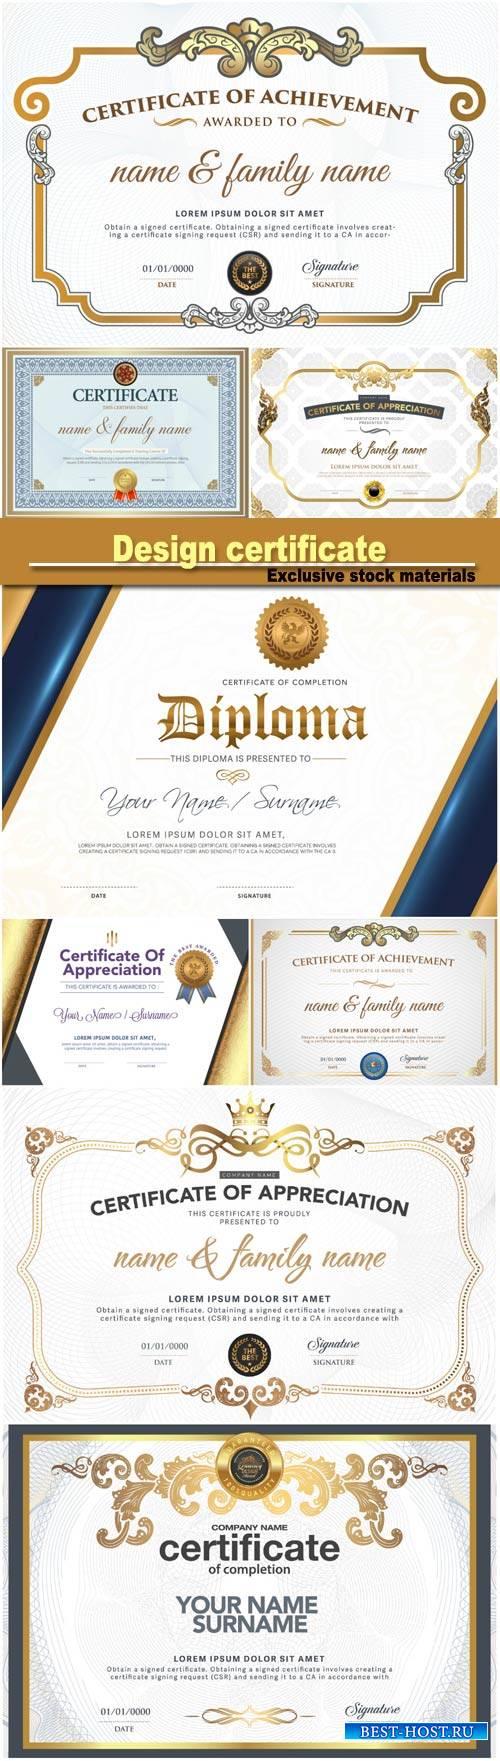 Design certificate, vector illustration